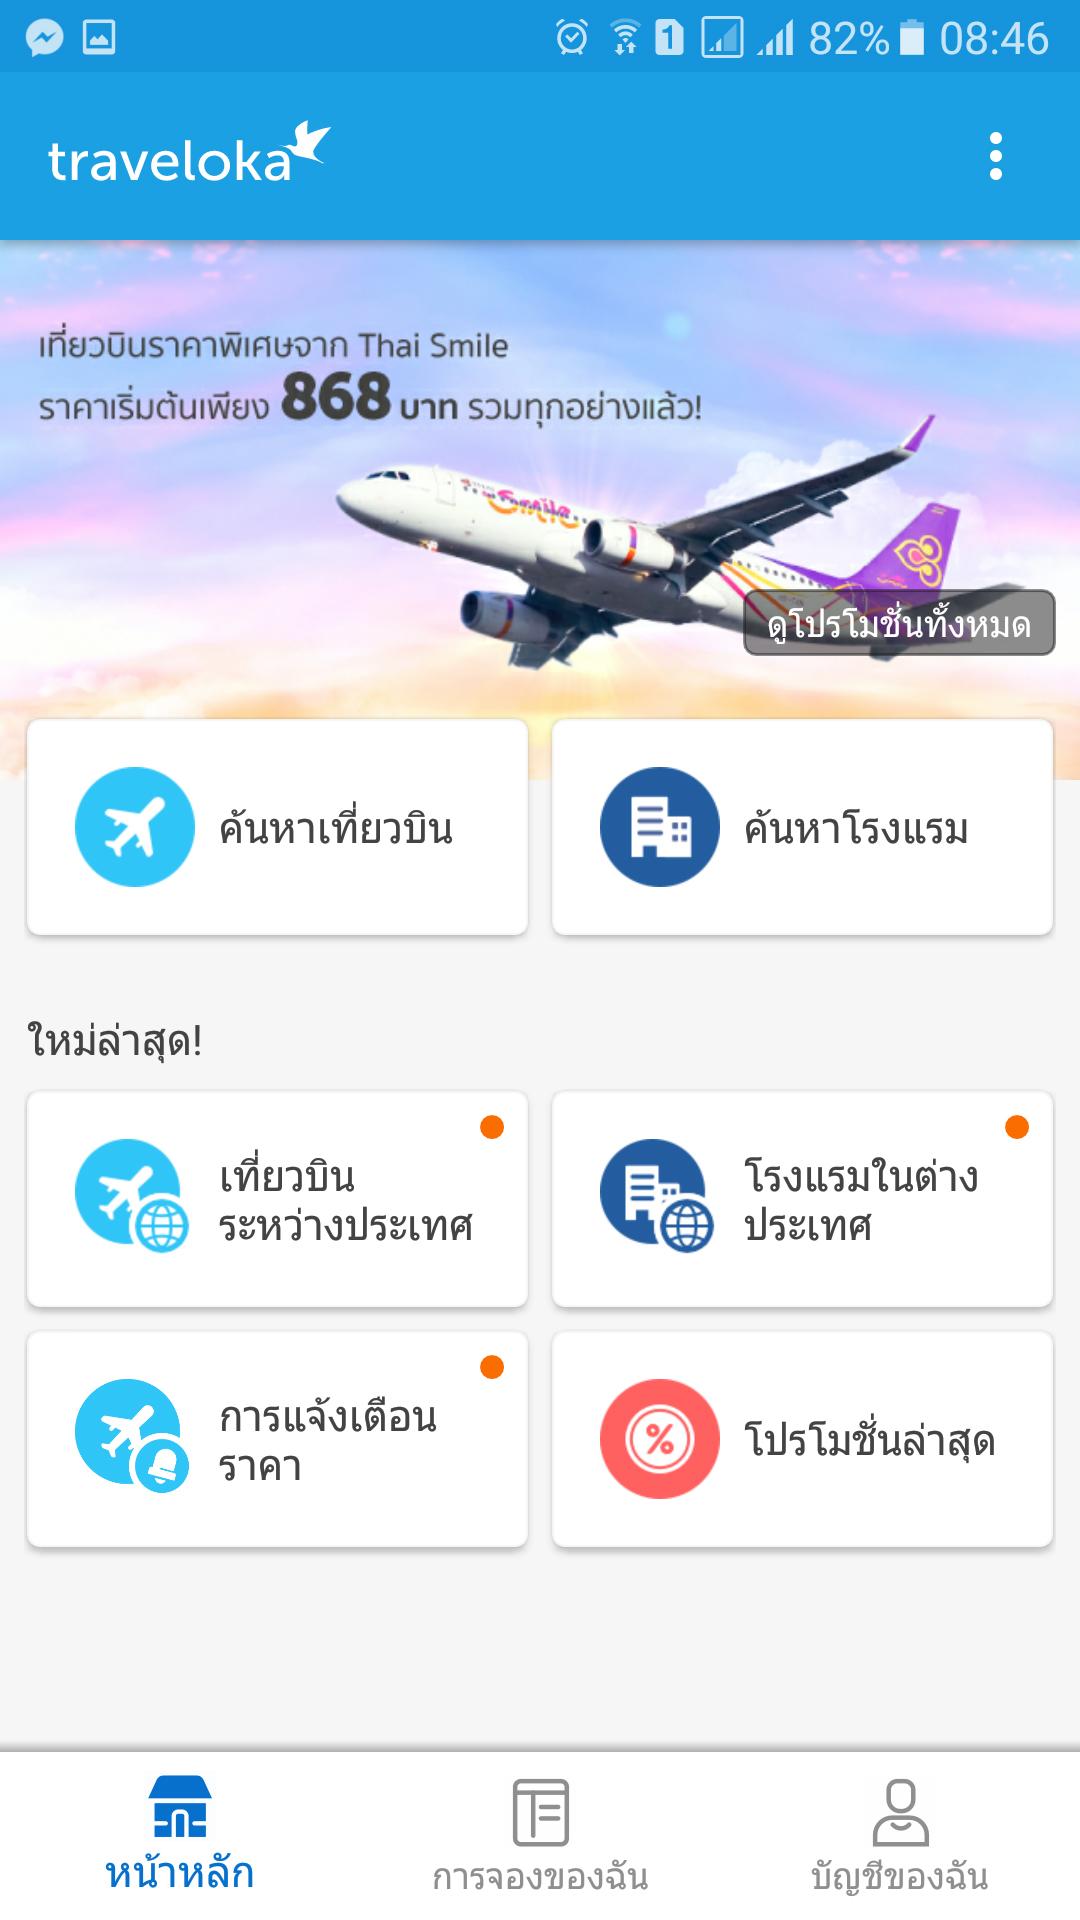 Traveloka Hotel Booking  Phu Pha Aonang Resort & Spa ภูผา อ่าวนาง รีสอร์ทแอนด์สปา Traveloka Hotel Booking 01